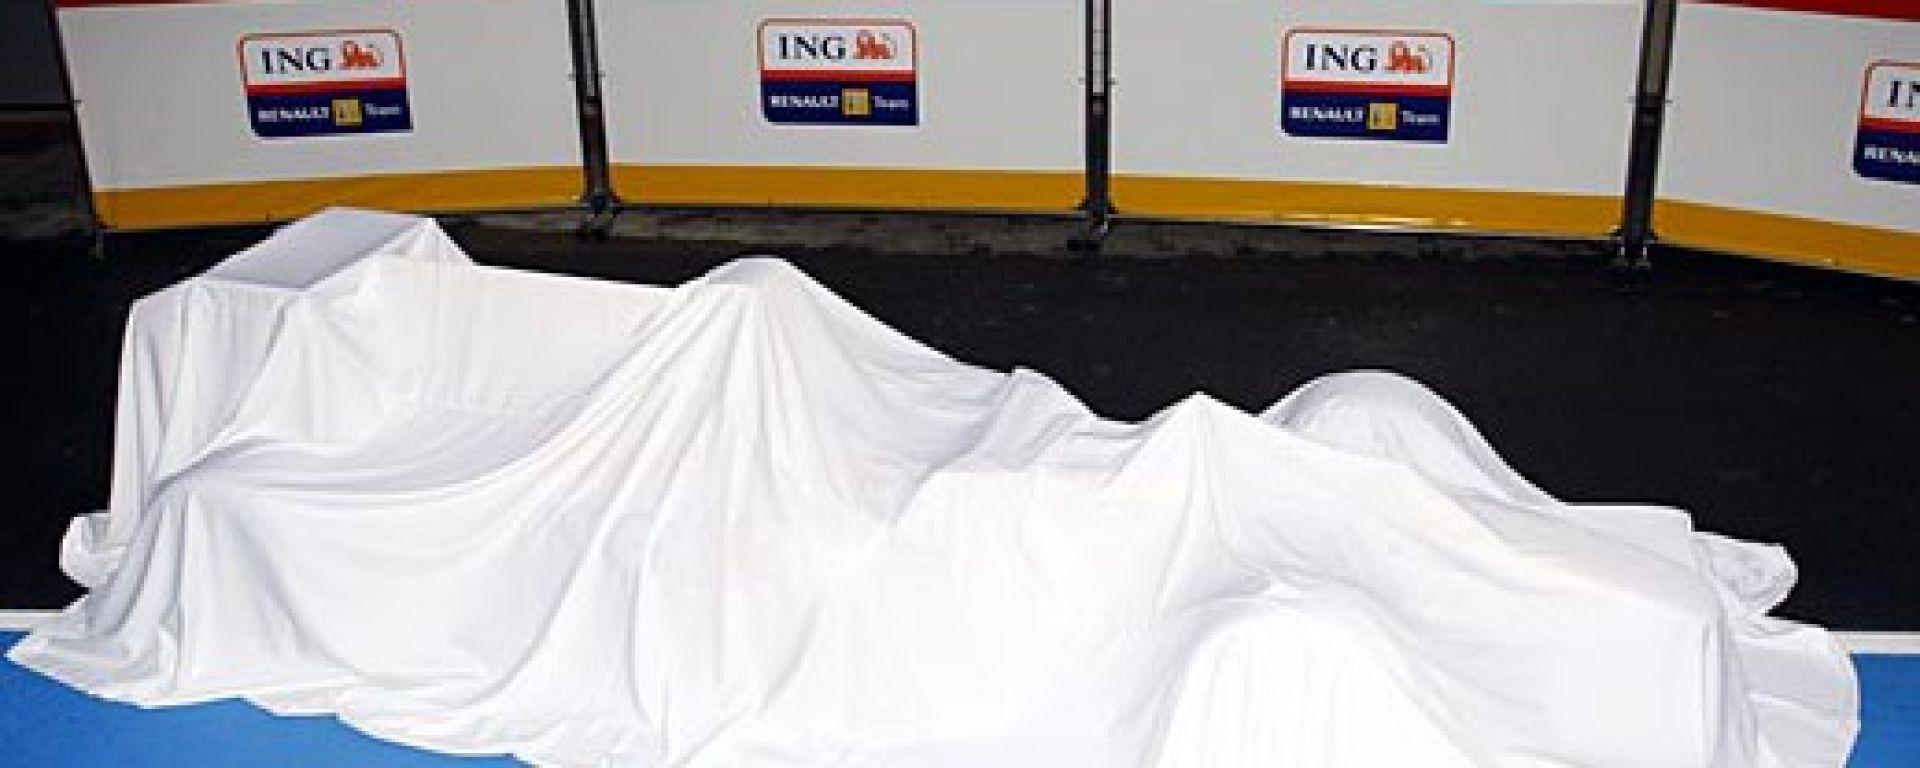 F1 2009: Renault R29